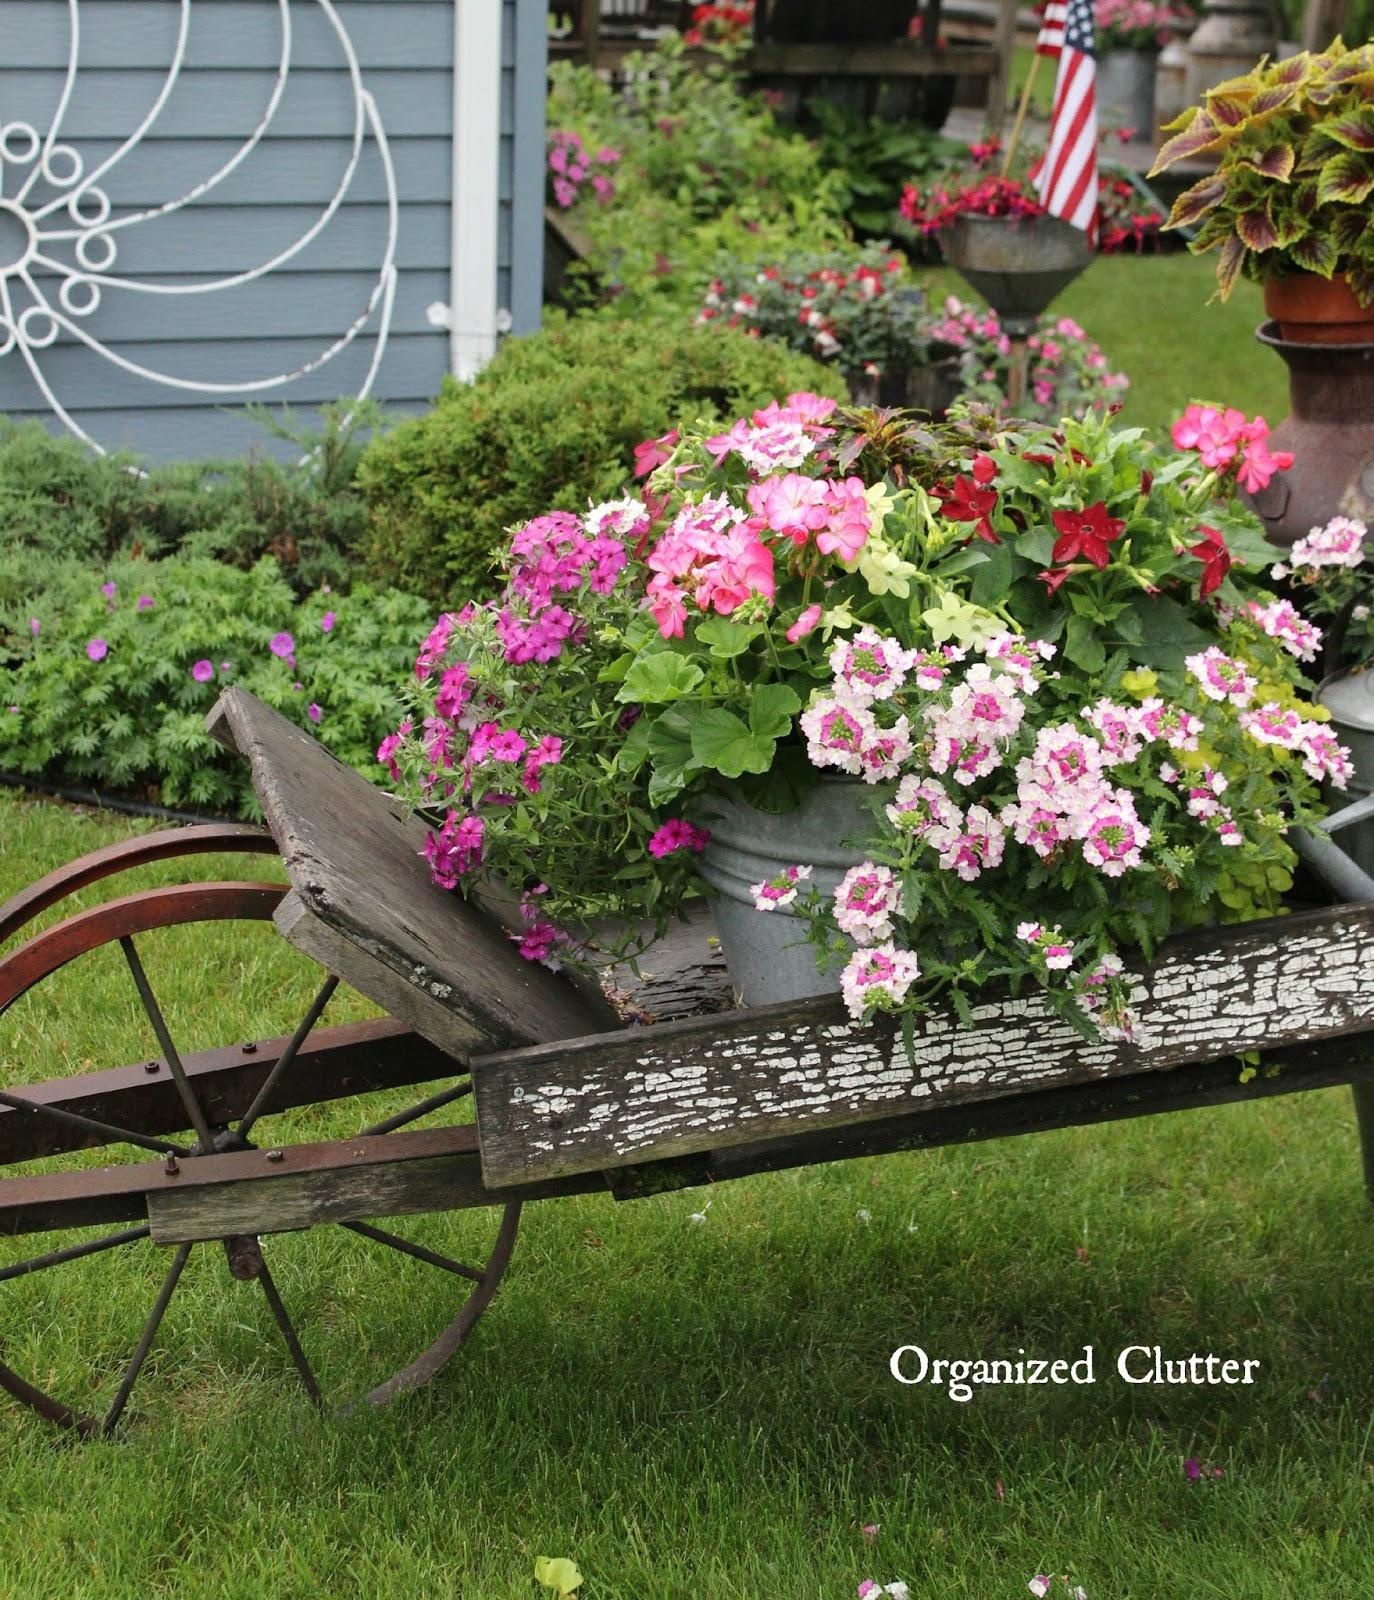 rustic garden wheelbarrow 2015 organized clutter - Rustic Garden 2015